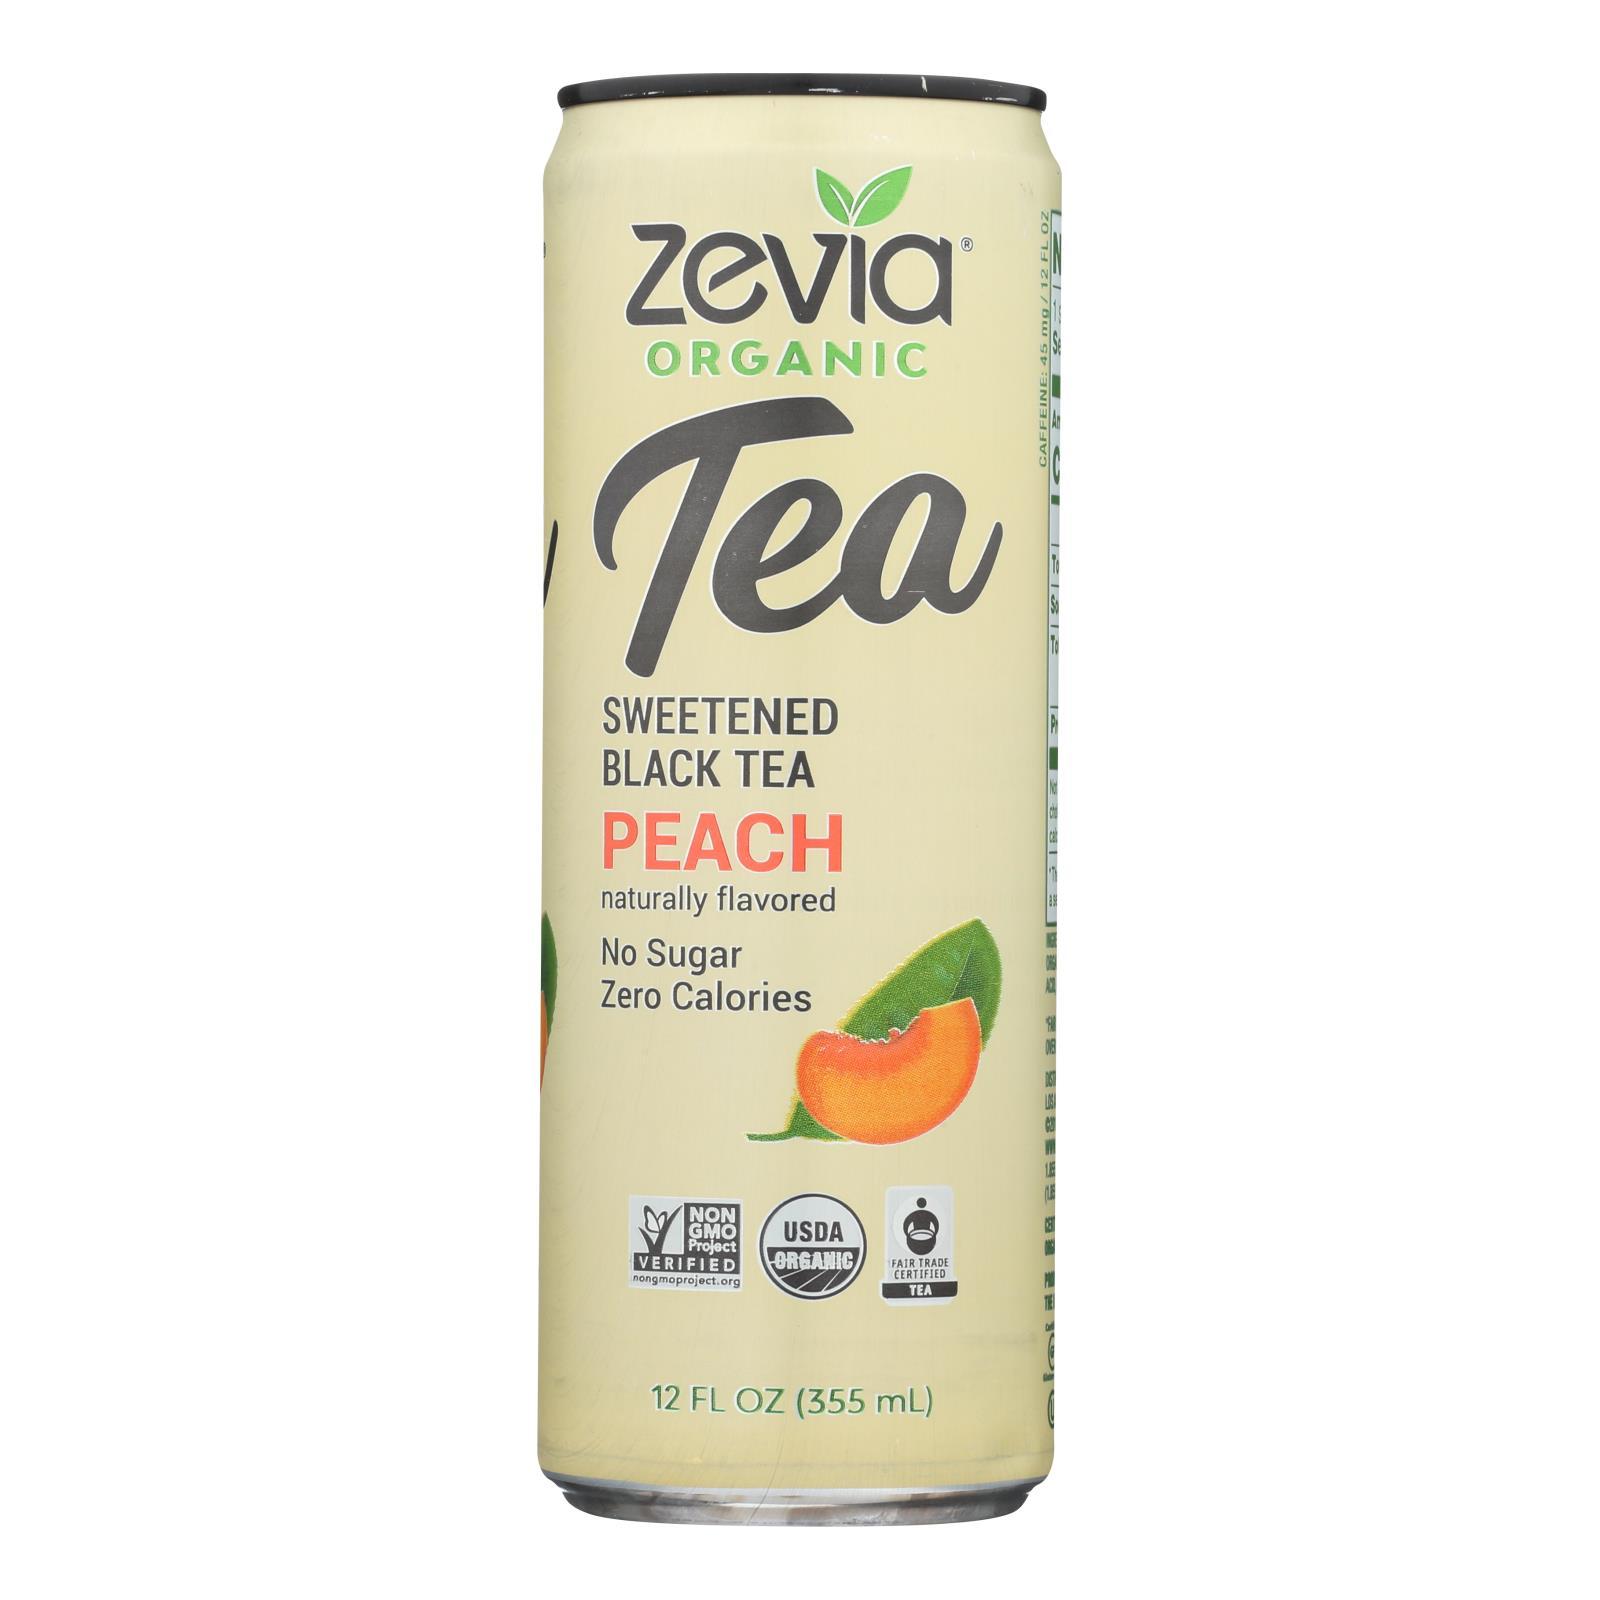 Zevia - Tea Black Peach - Case of 12 - 12 FZ